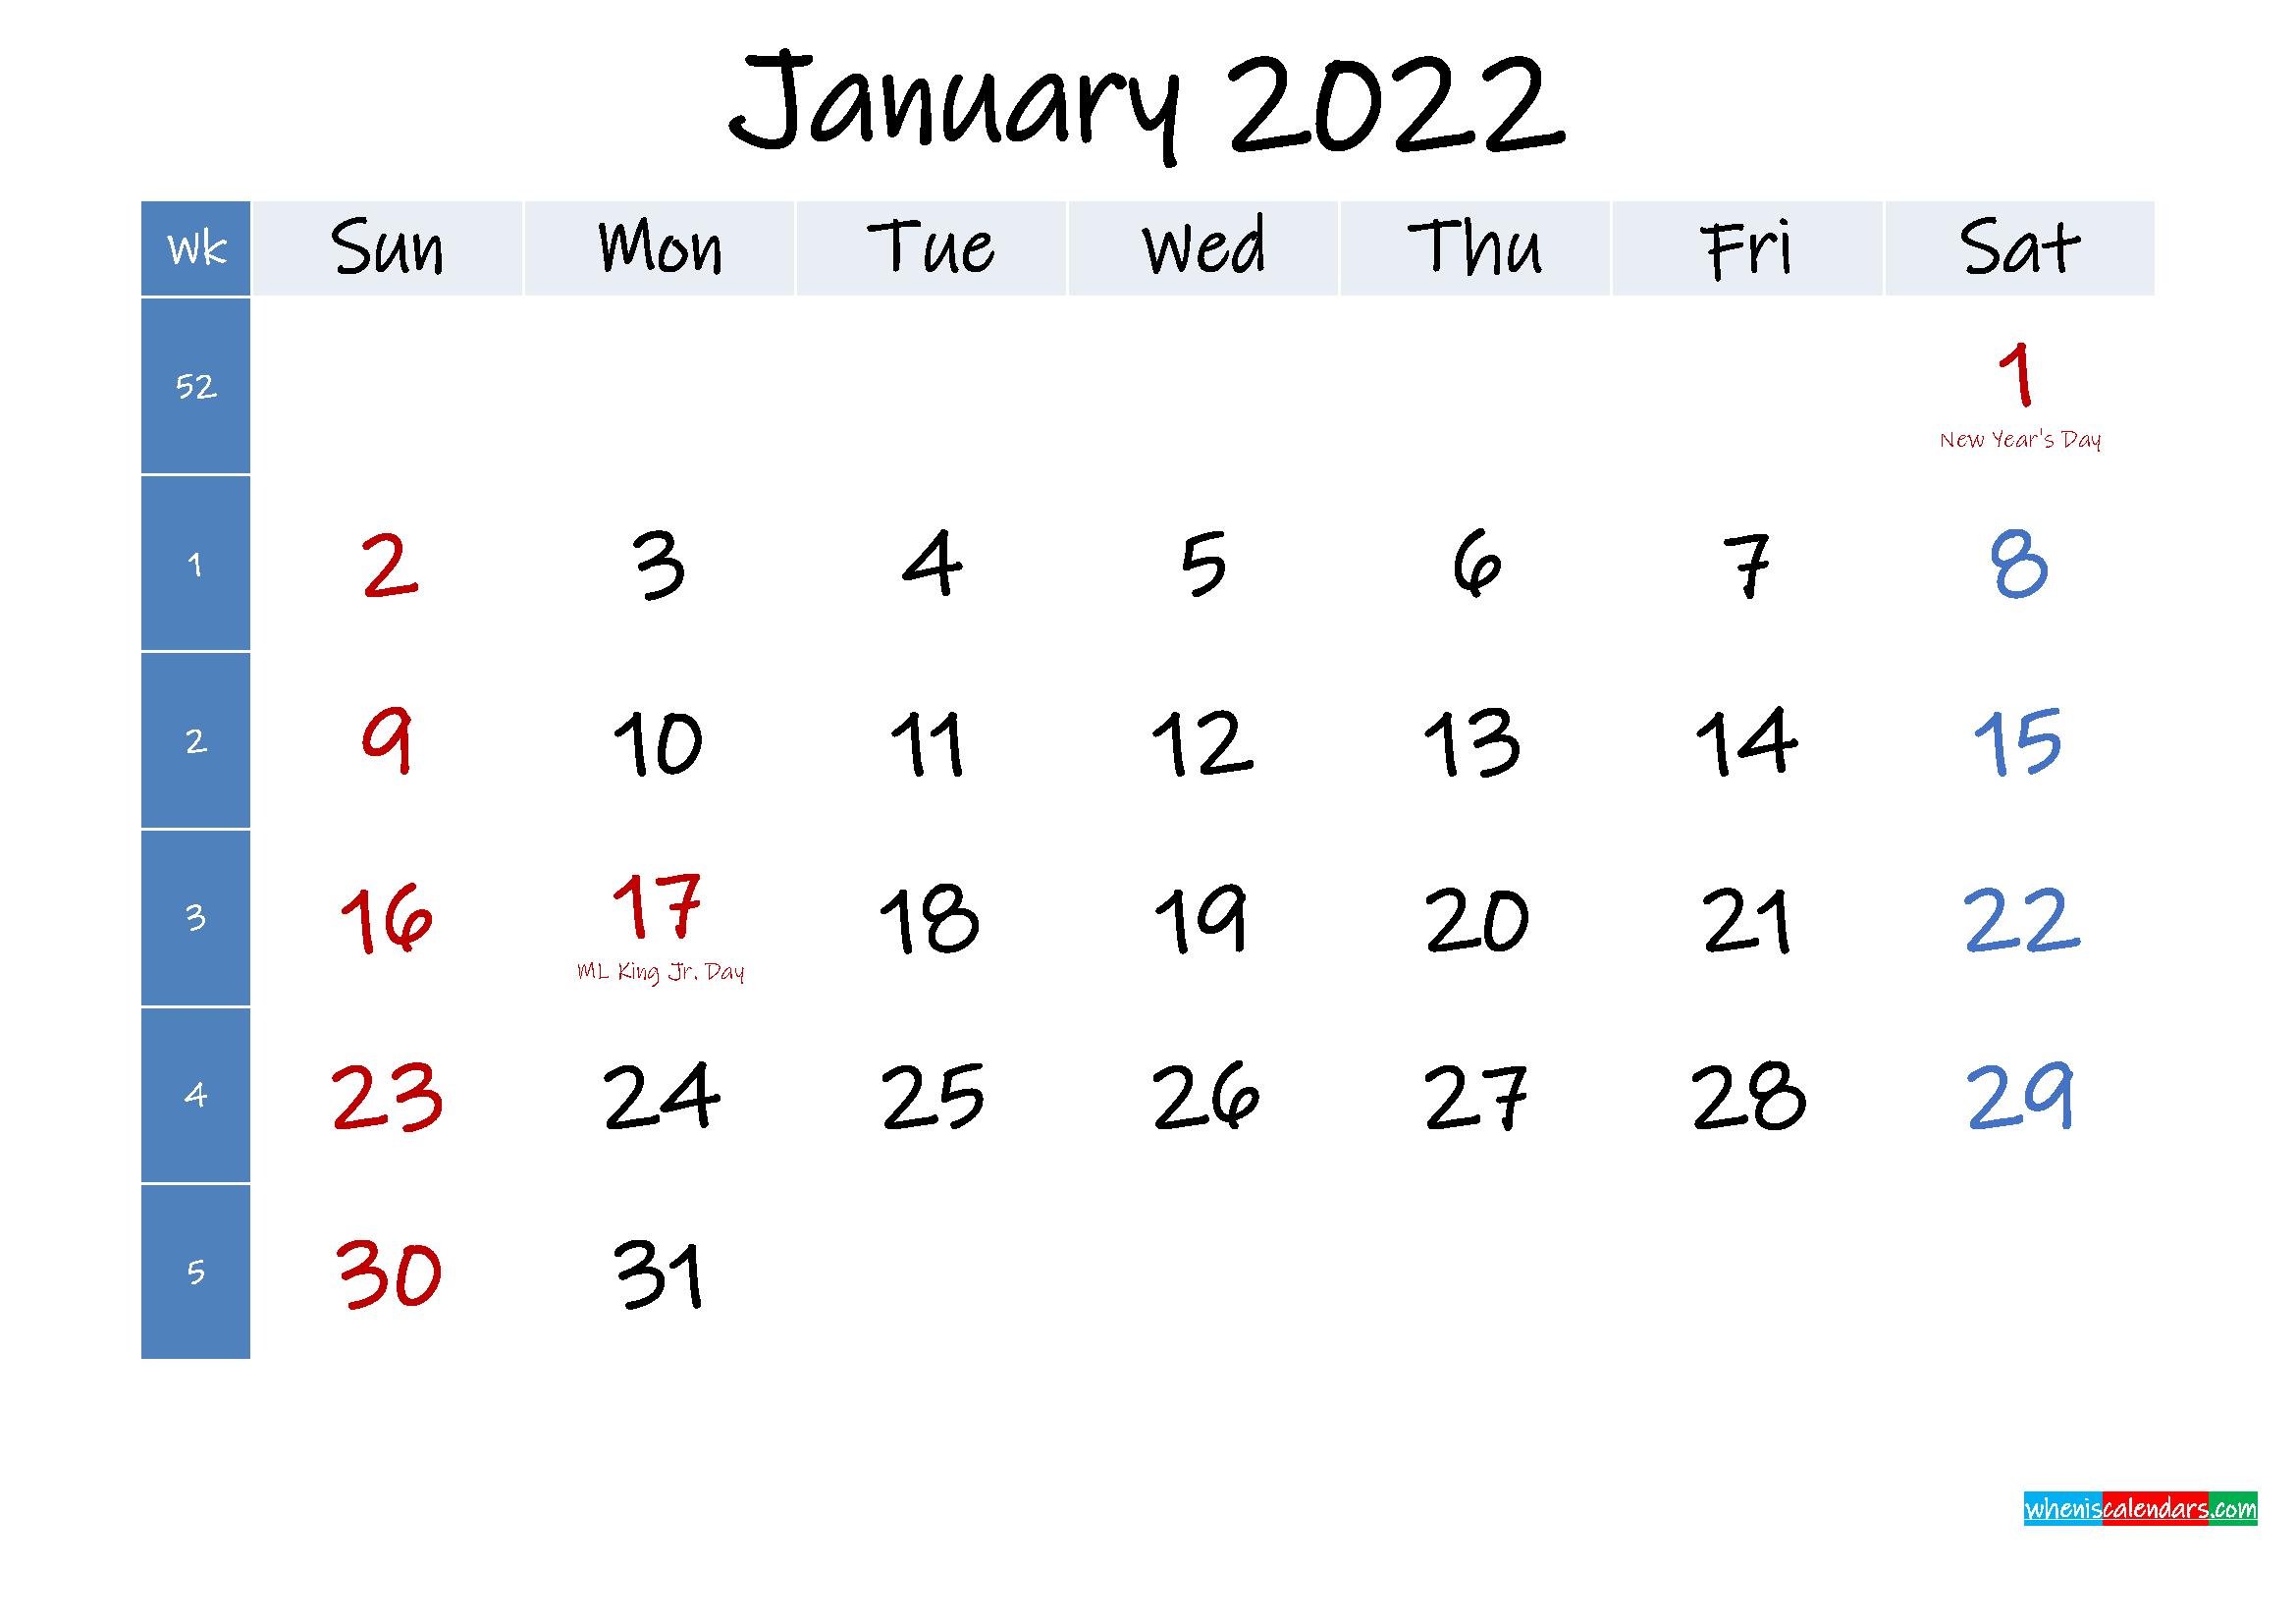 January 2022 Free Printable Calendar With Holidays Inside Calendar 2022 January Printable